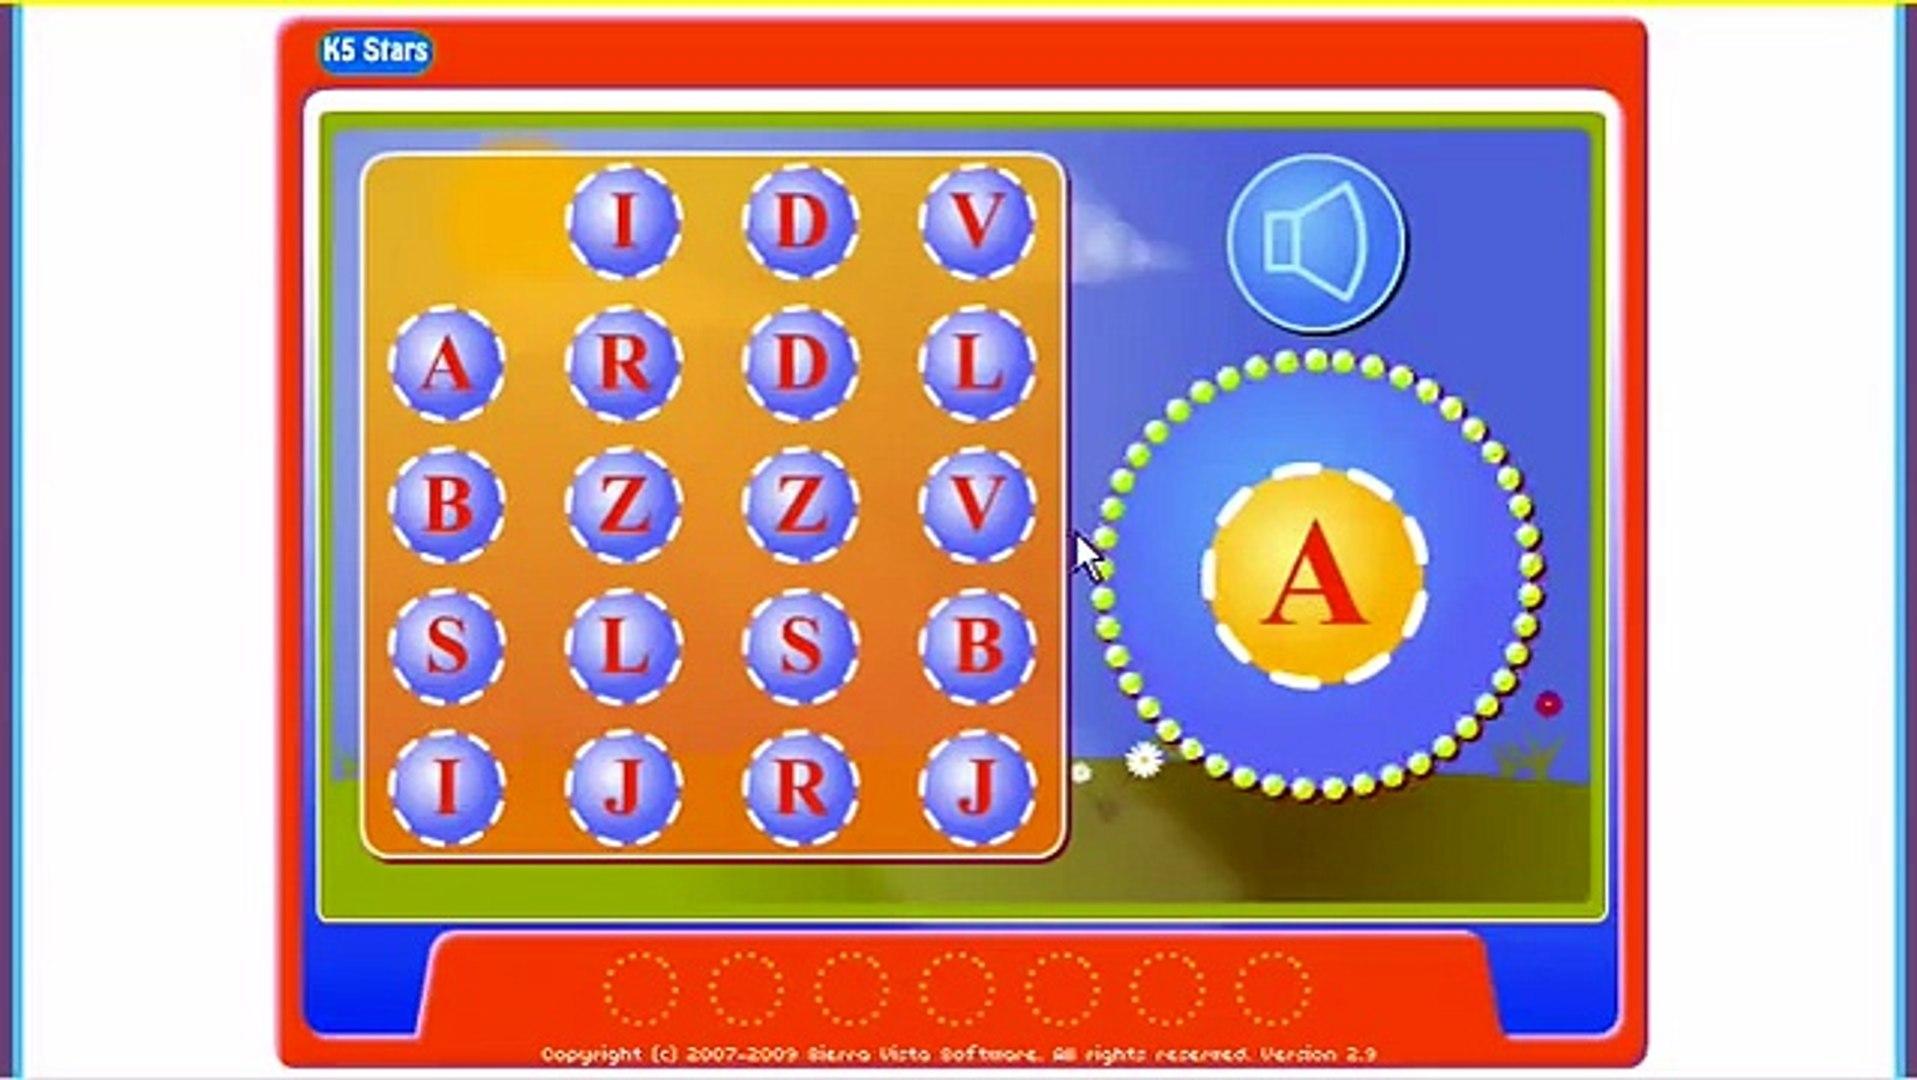 K5 Stars - 300 Fun Online Games for kids education